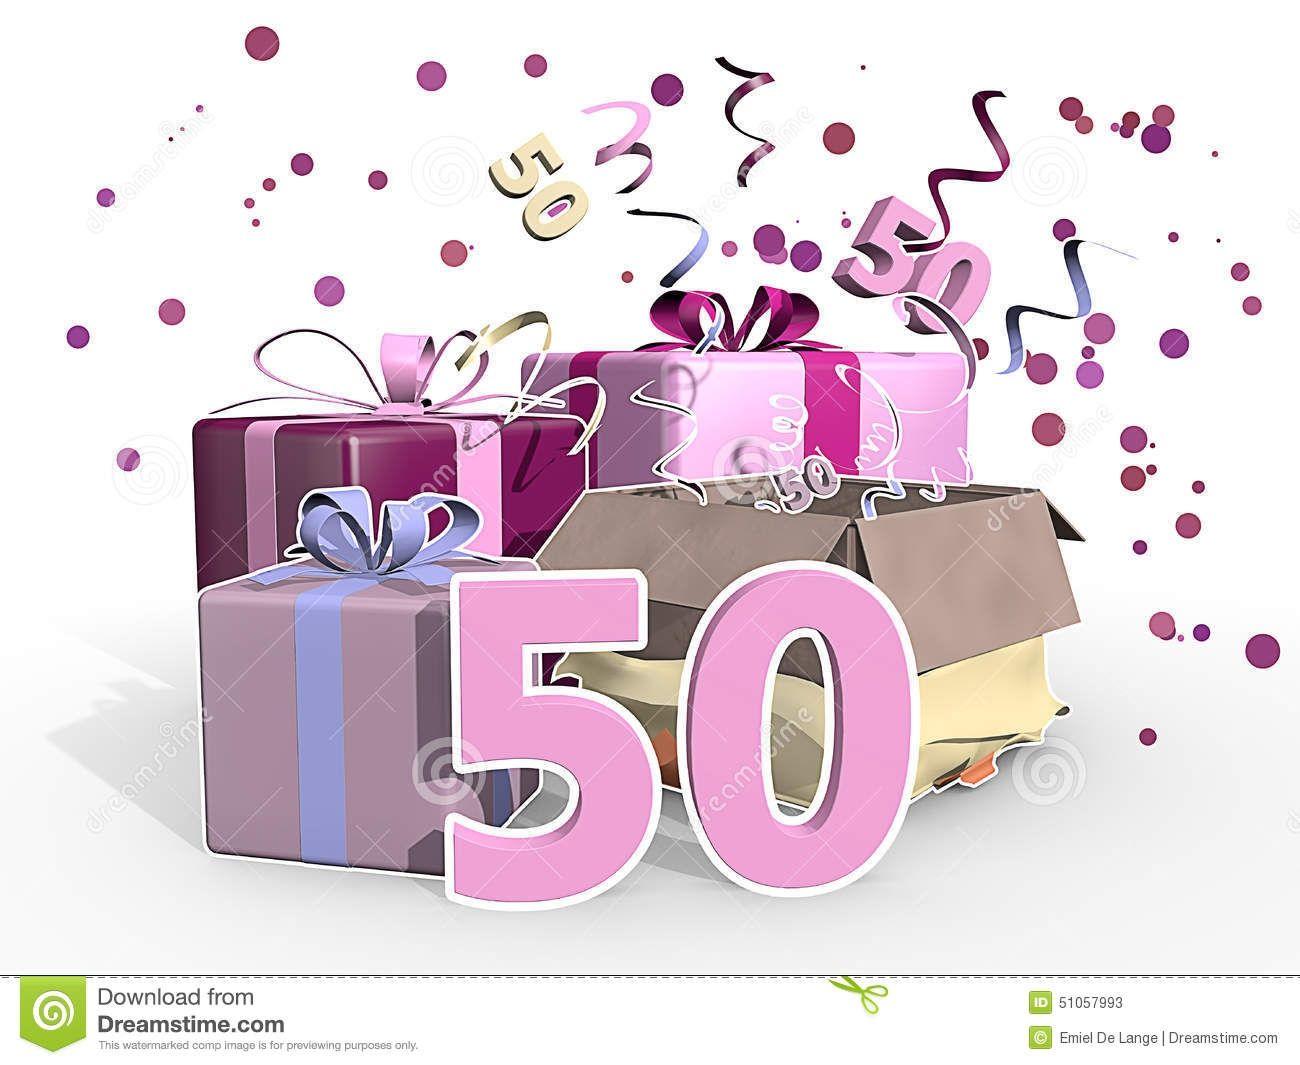 tarjetas de cumplea os 50 mujer en hd gratis 2 hd